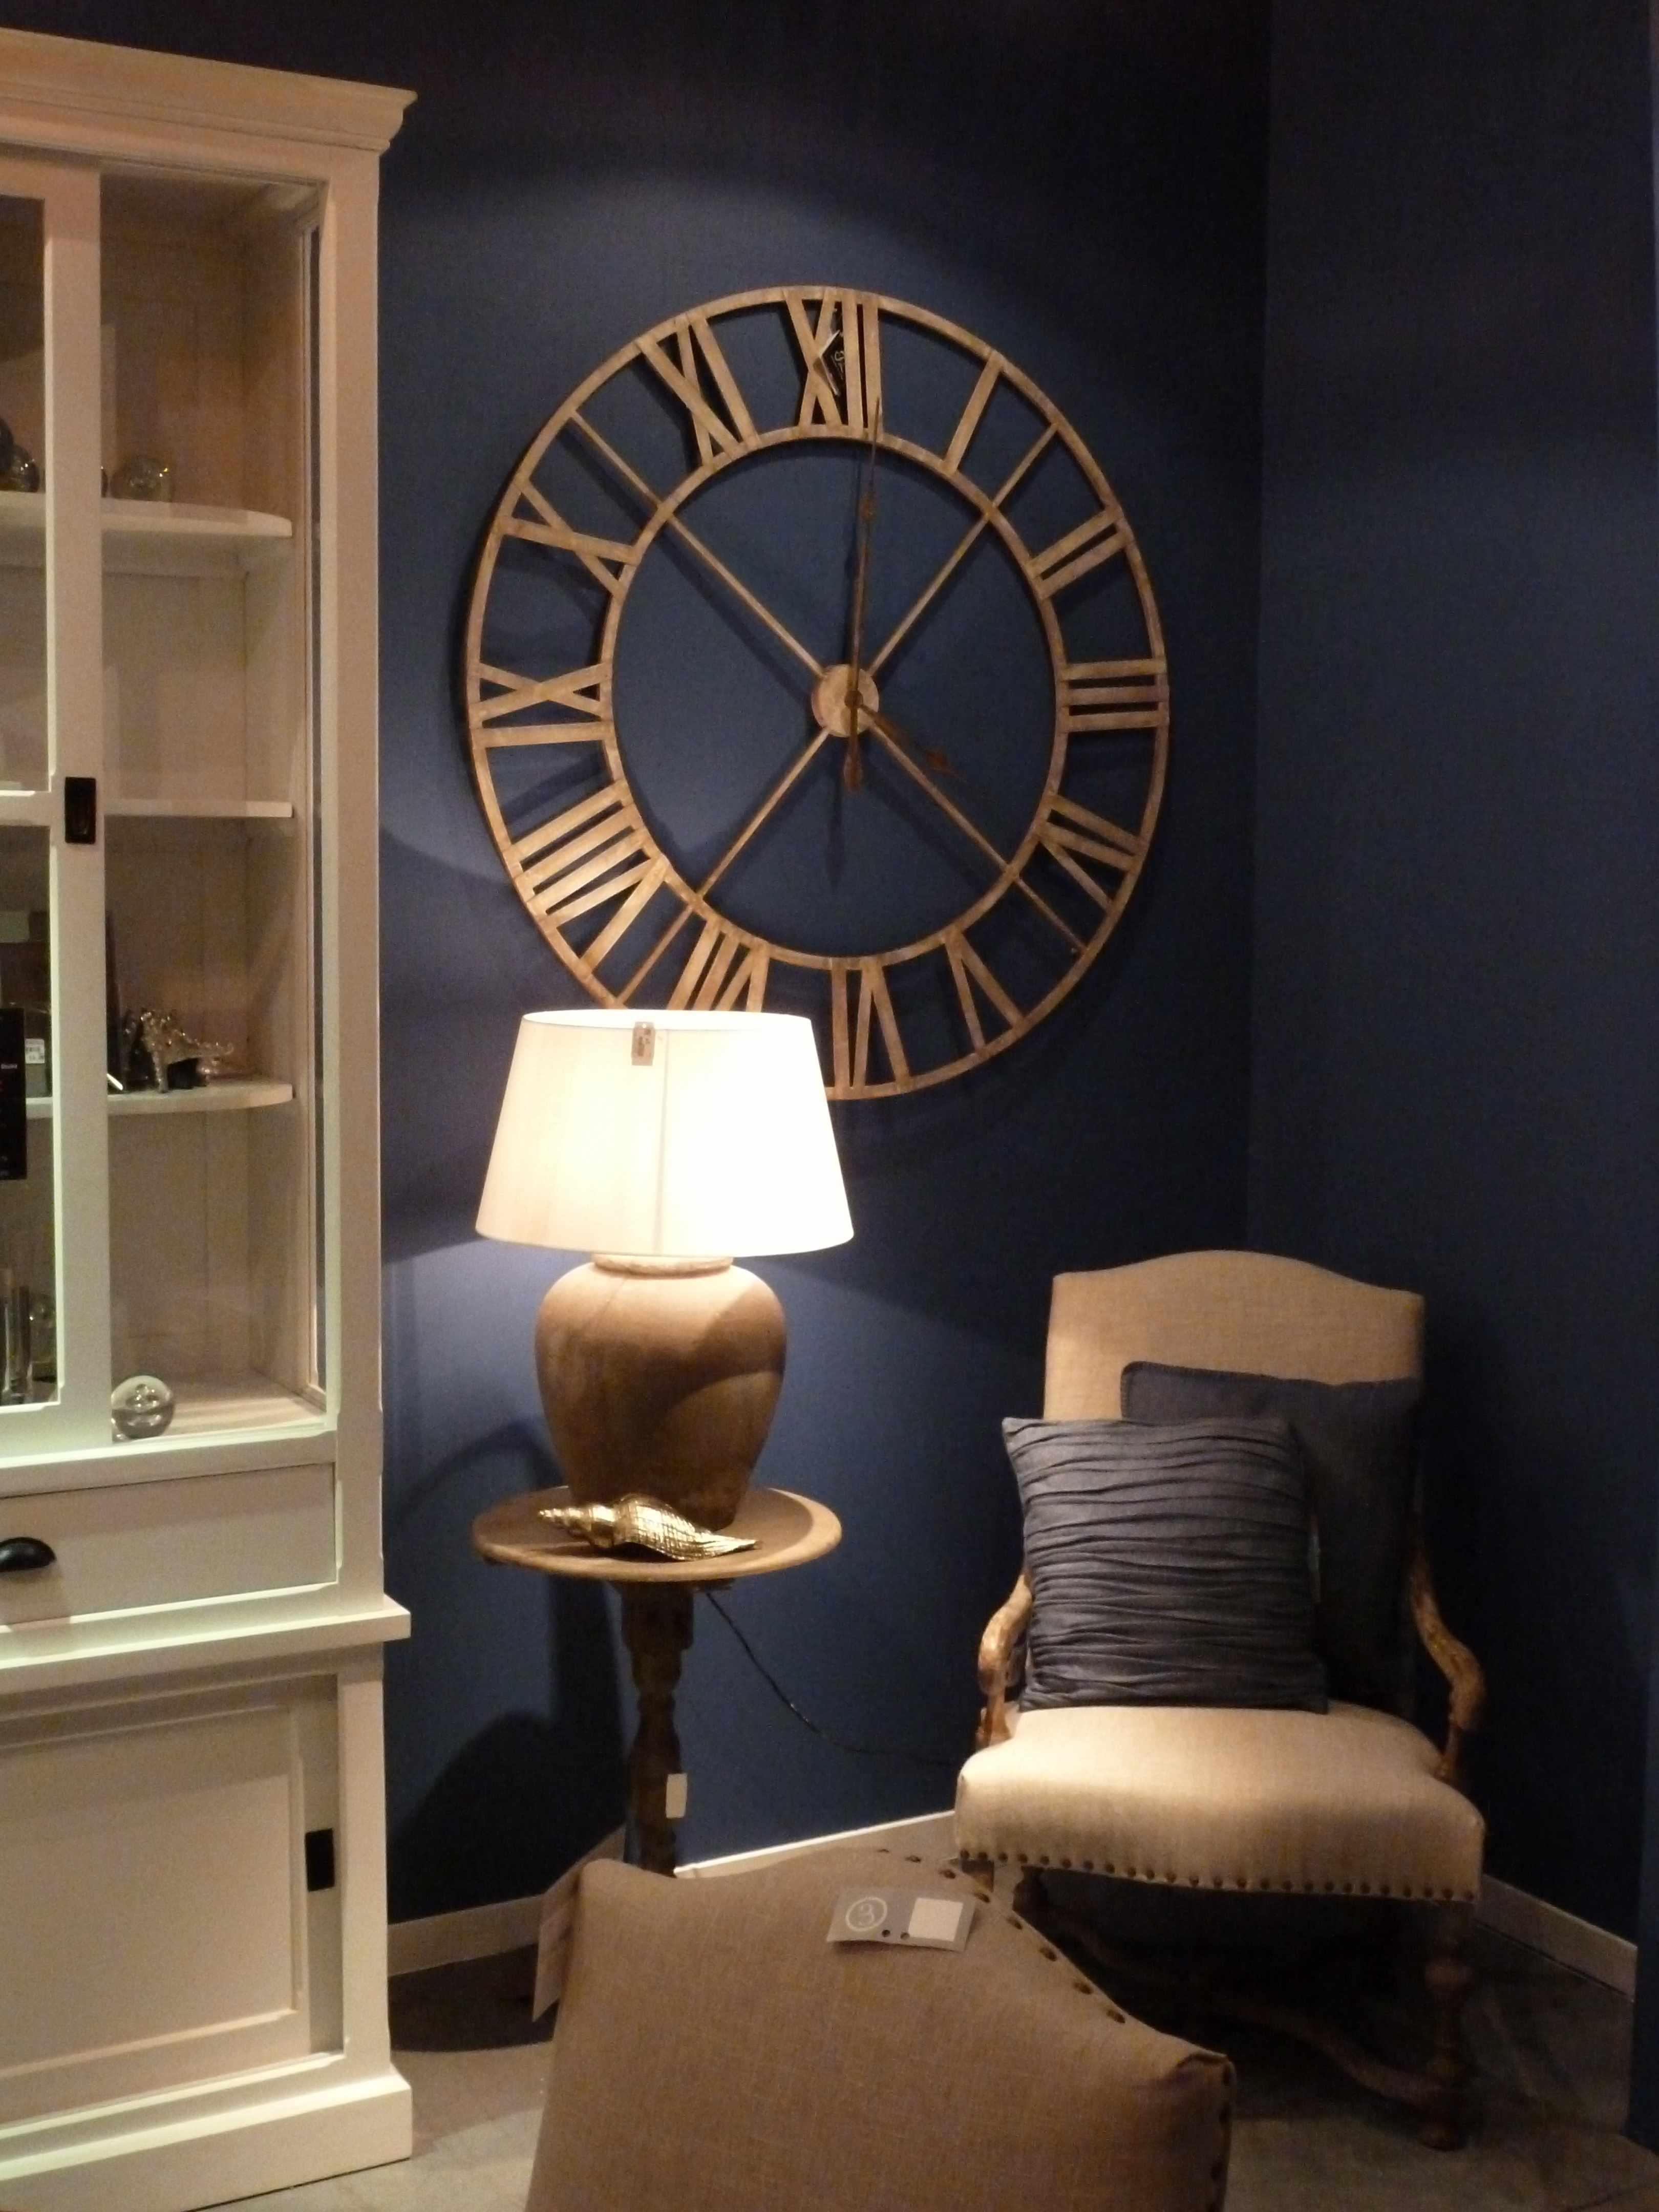 salon bleu paon total look bleu vert dans toute la maison ide n - Bleu Attu Salon